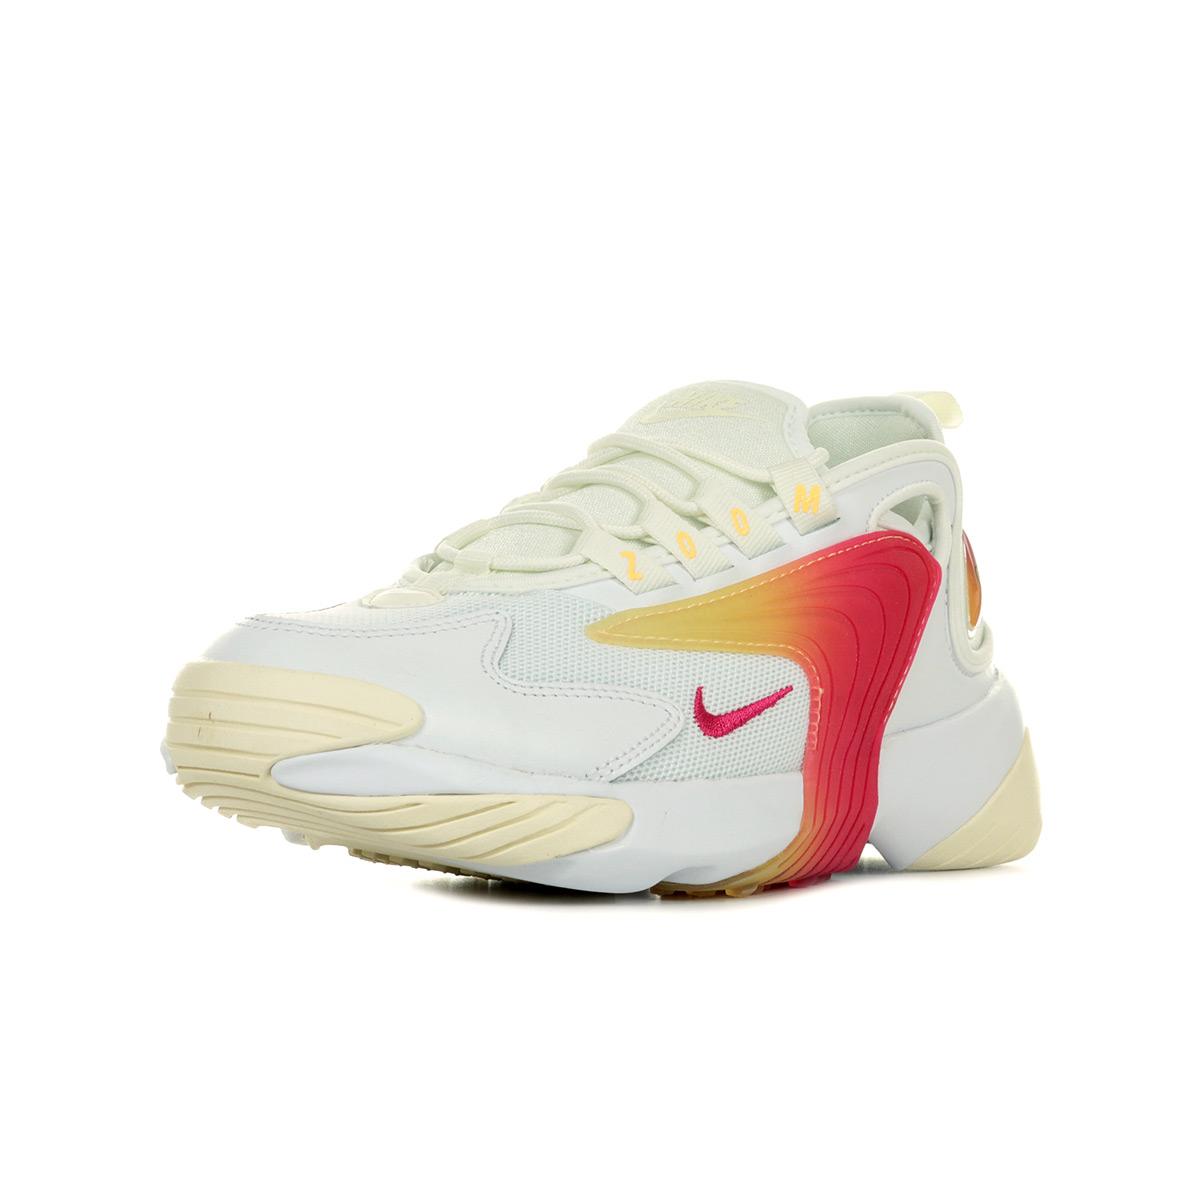 acheter populaire 4827b 669c9 Nike Wn's Zoom 2K